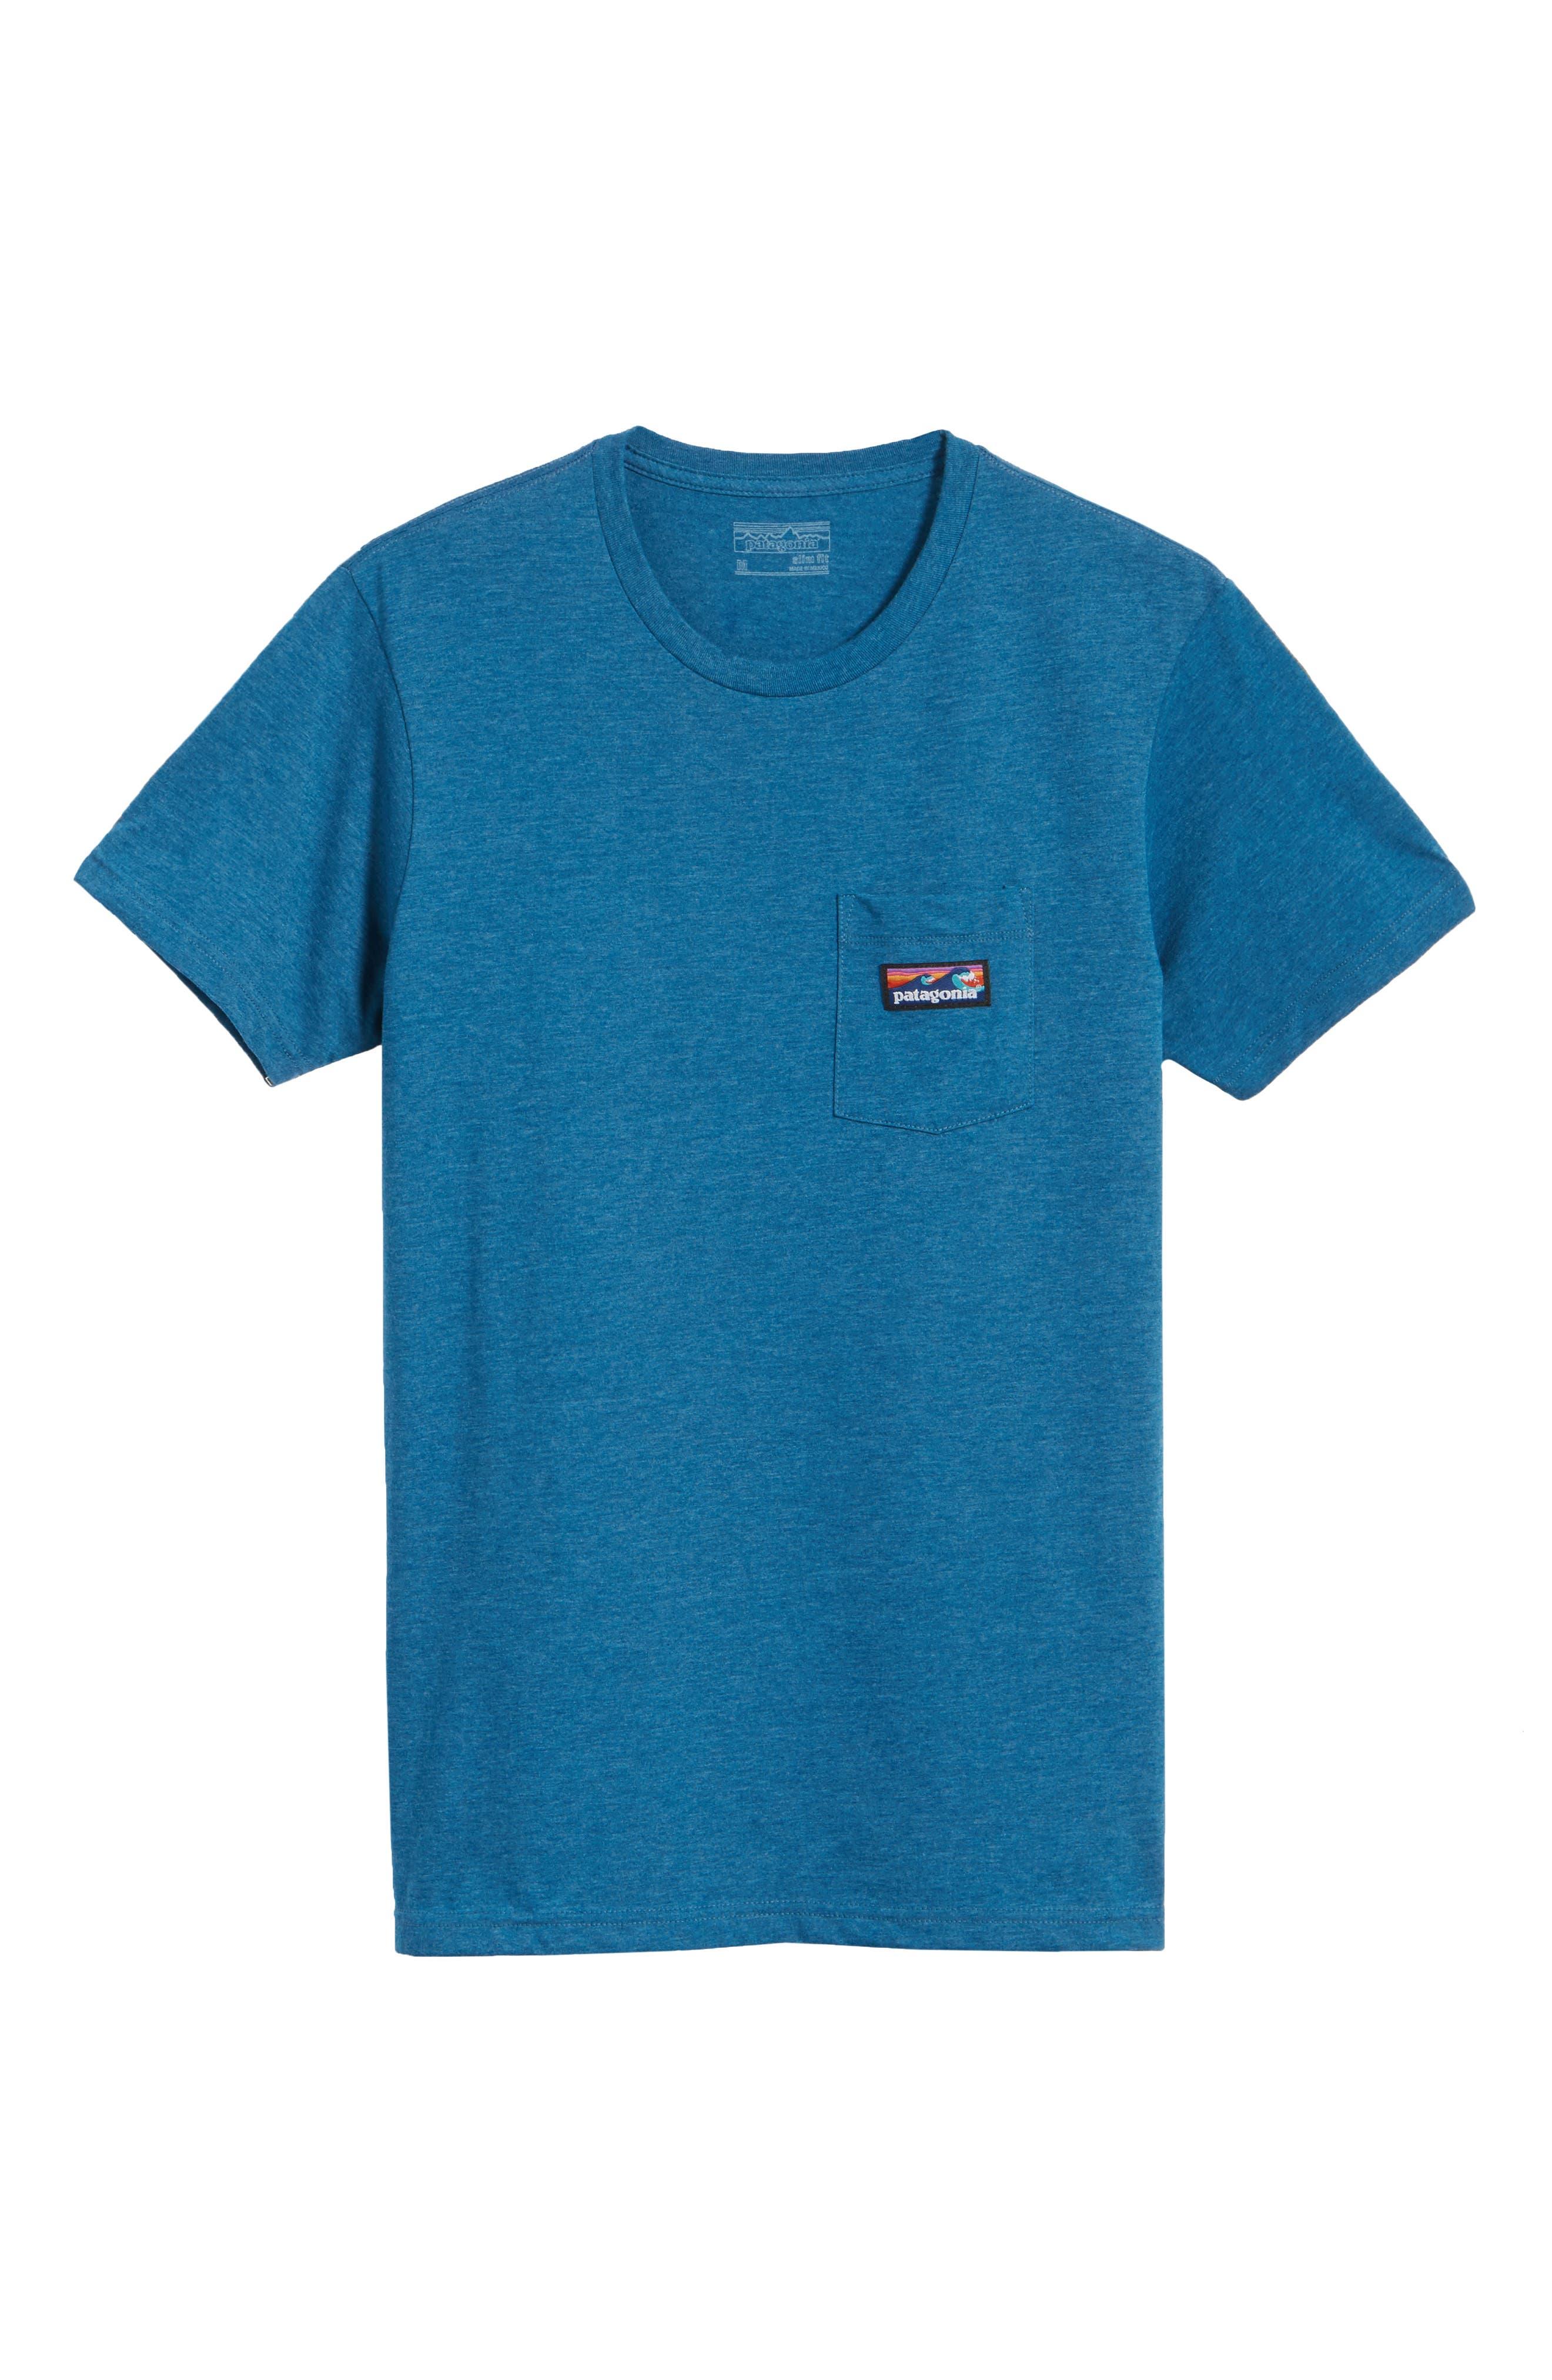 Board Short Label T-Shirt,                             Alternate thumbnail 6, color,